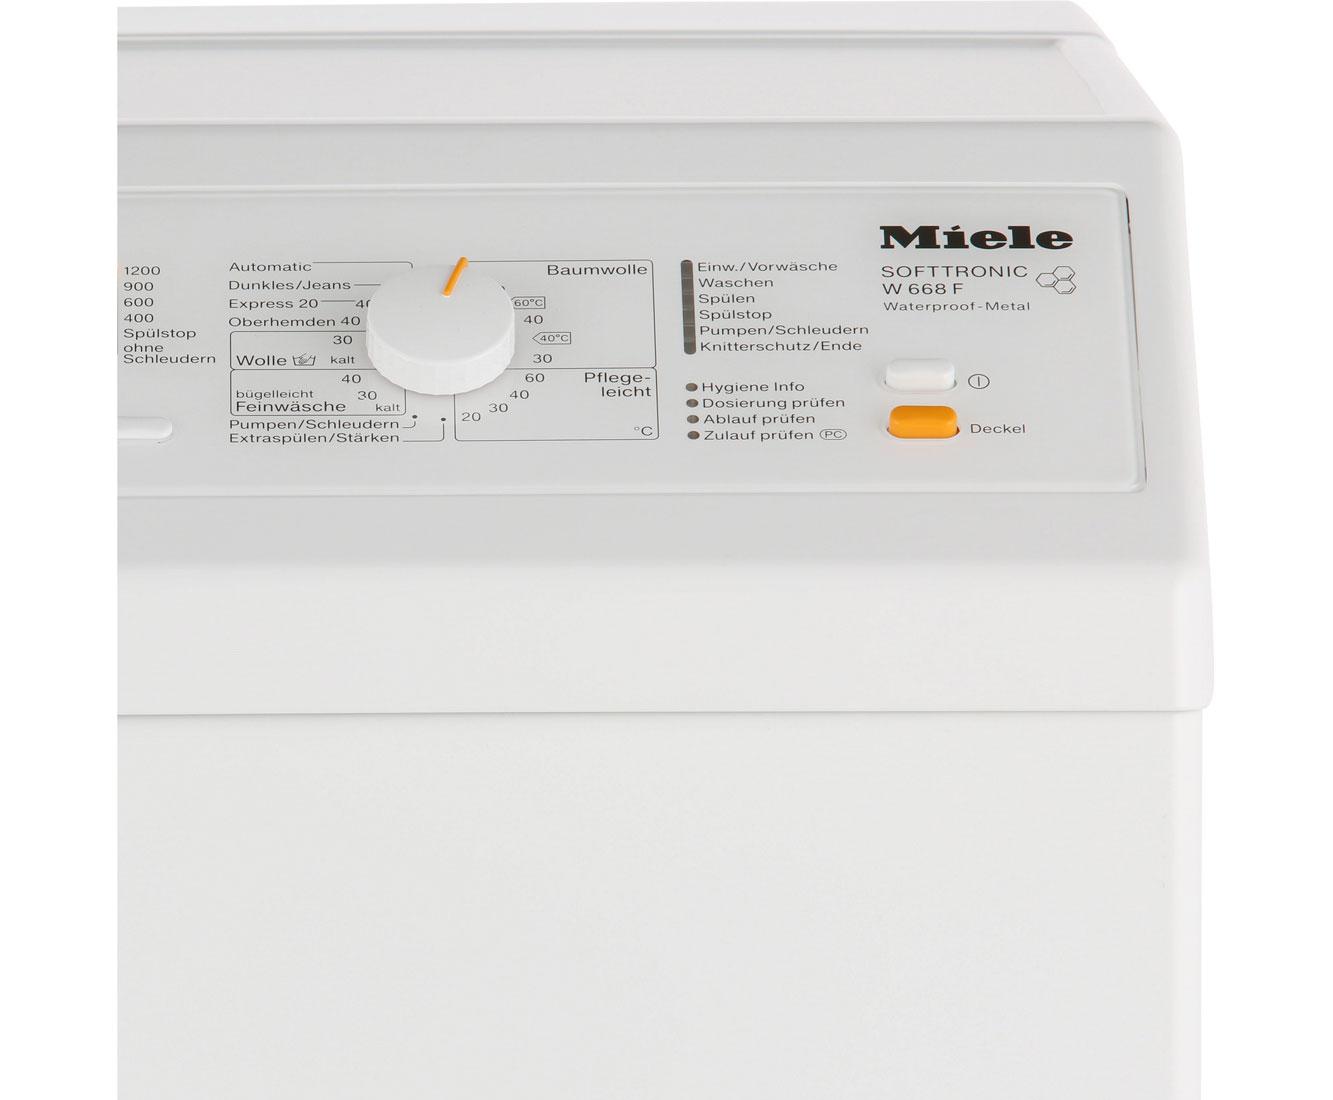 Miele W 668 F Wpm Waschmaschine Weiß Toplader 6 Kg 1200 U Min A